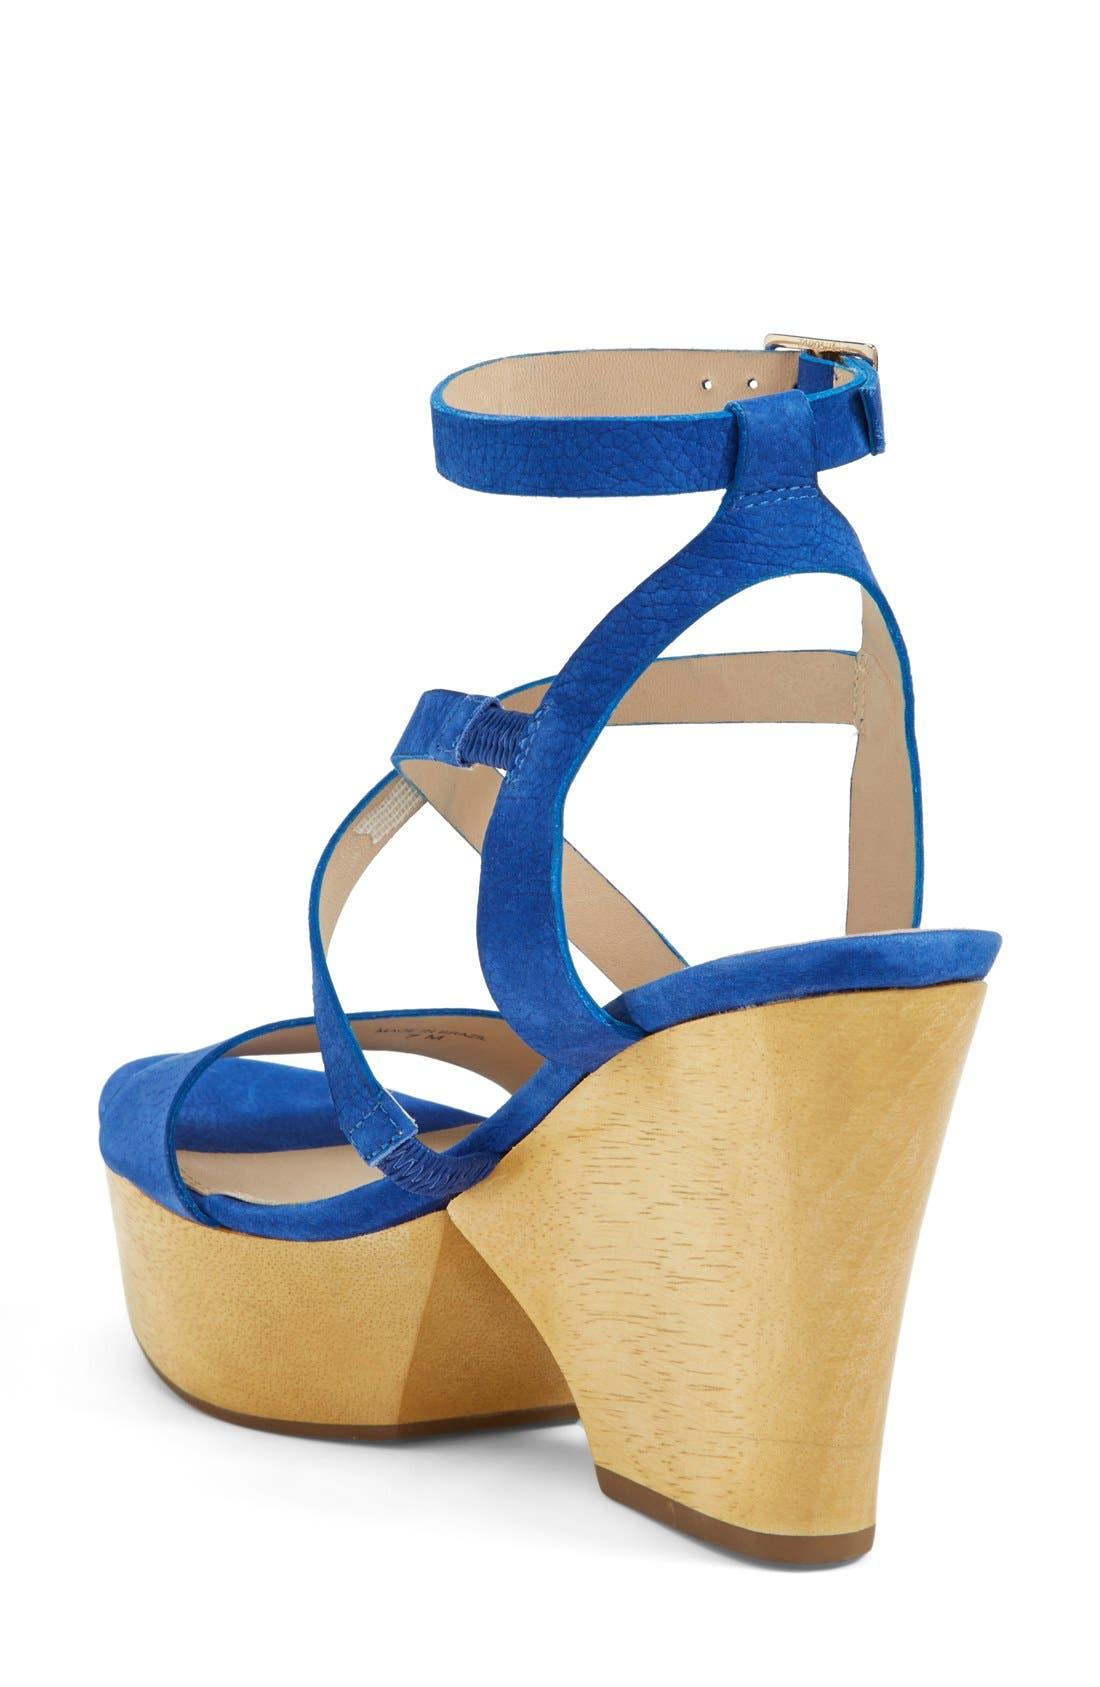 DIANE VON FURSTENBERG,                             'Lamille' Leather Platform Wedge Sandal,                             Alternate thumbnail 3, color,                             485